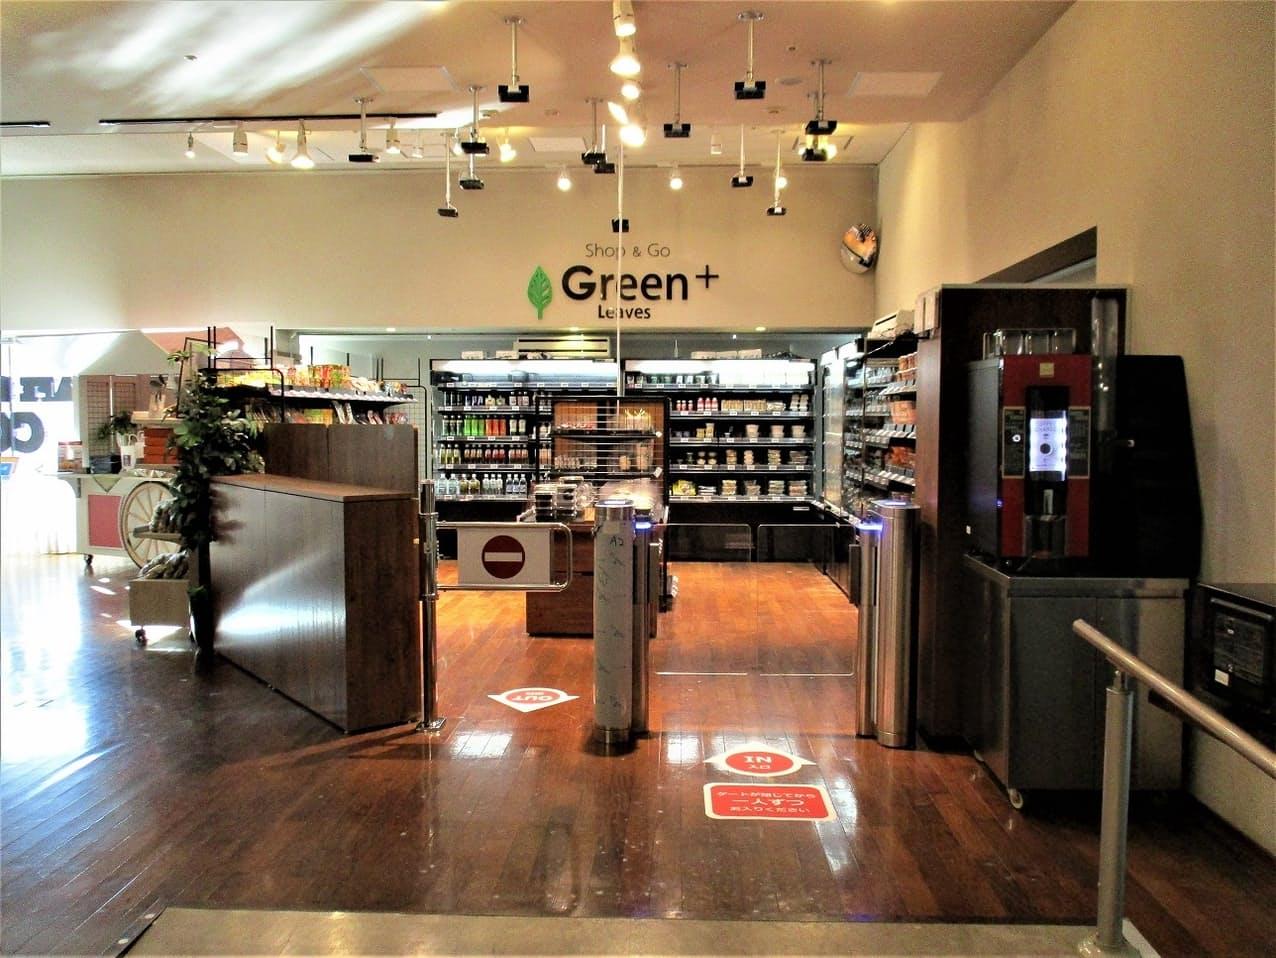 Fujitsu palm and face biometrics for retail customer authentication